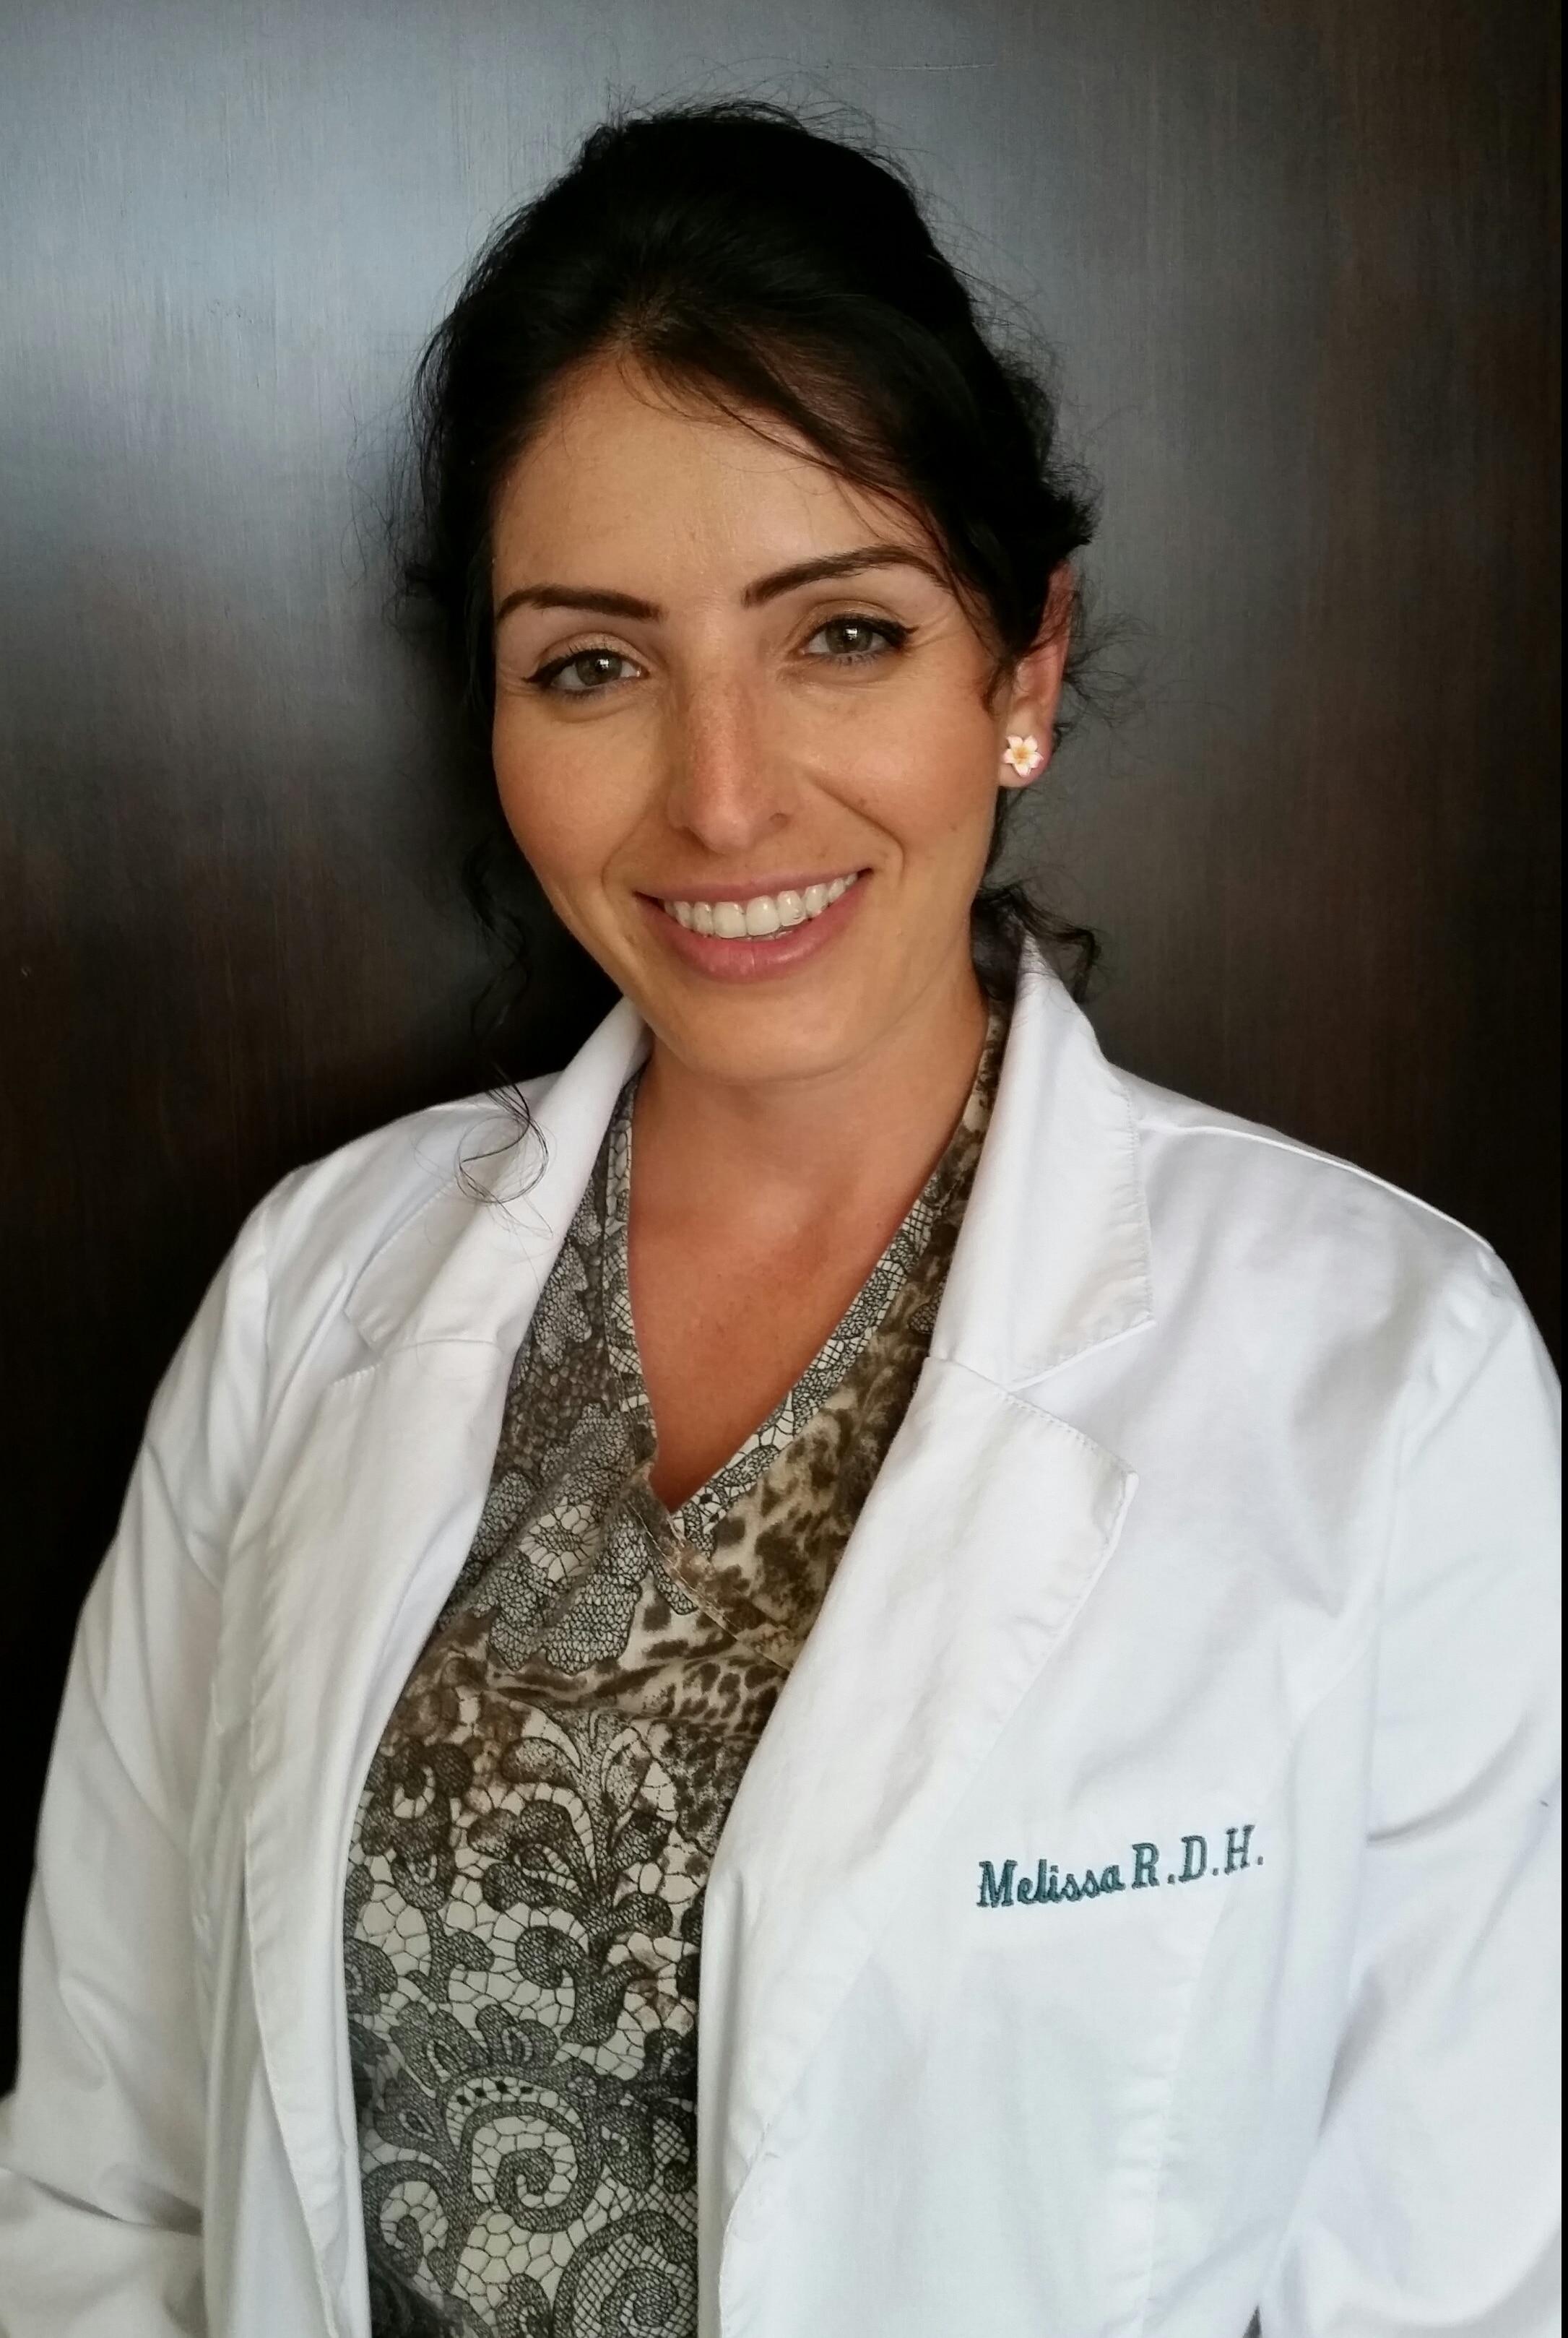 Melissa Hygienist Dr George Dds